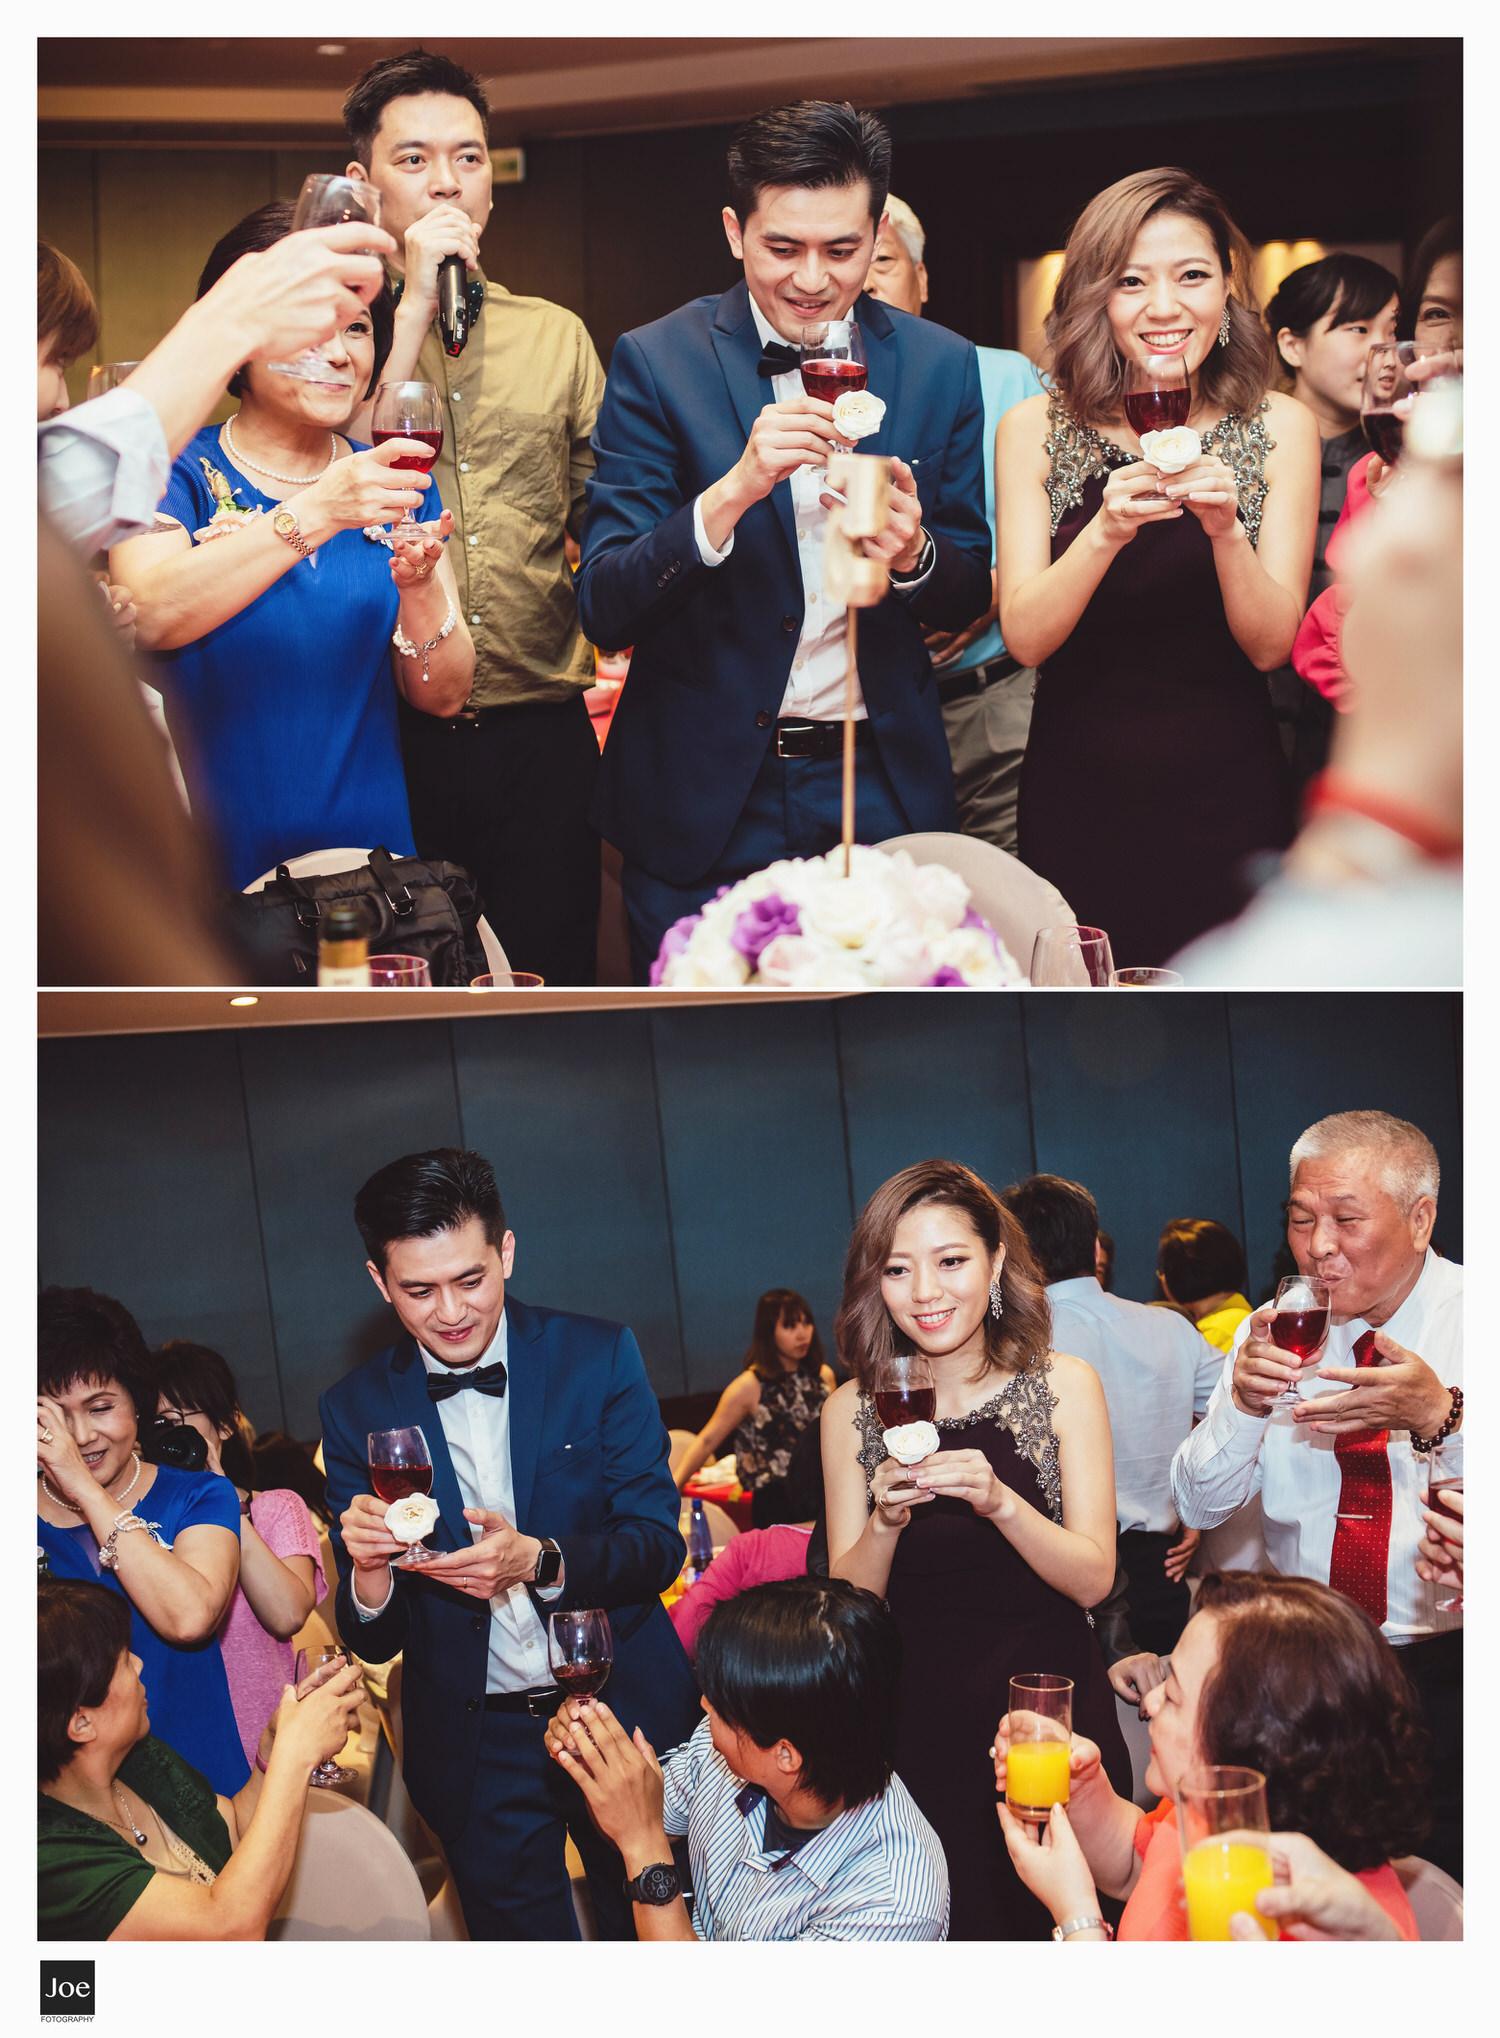 wedding-photography-shangri-la-far-eastern-plaza-hotel-ariel-sam-joe-fotography-176.jpg